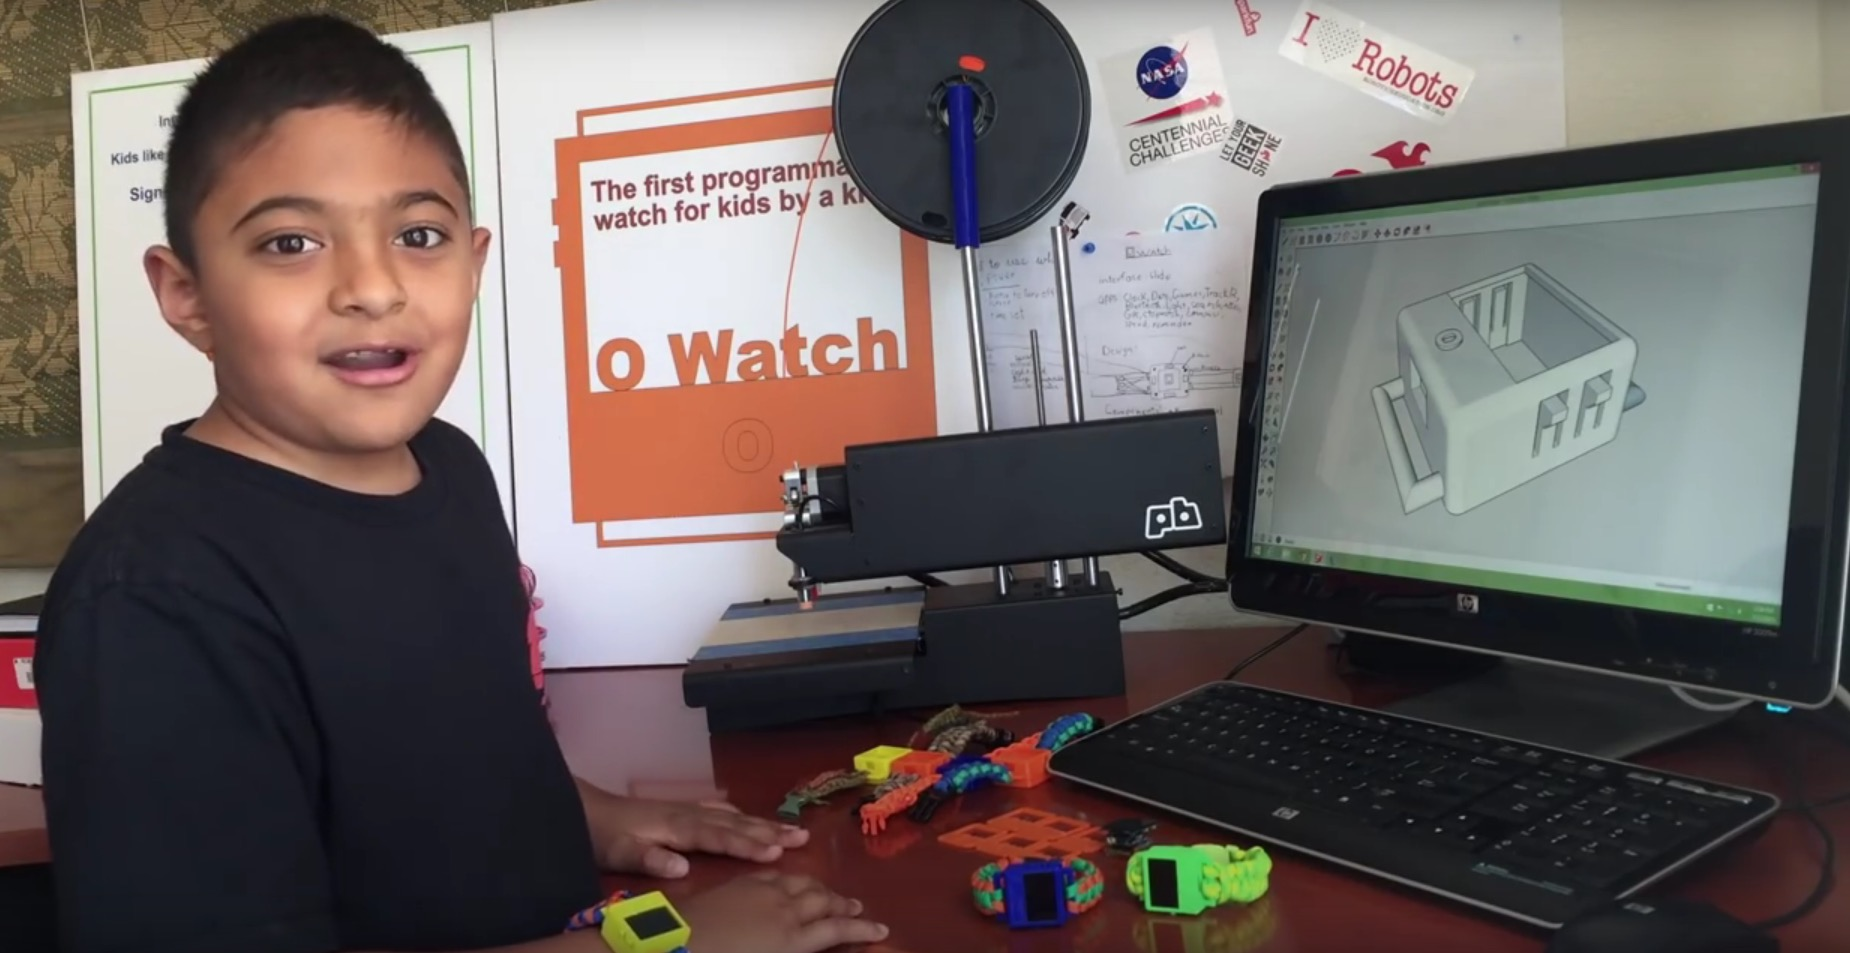 〔 3D打印 〕8歲小朋友印智能錶   裝app測溫樣樣皆能